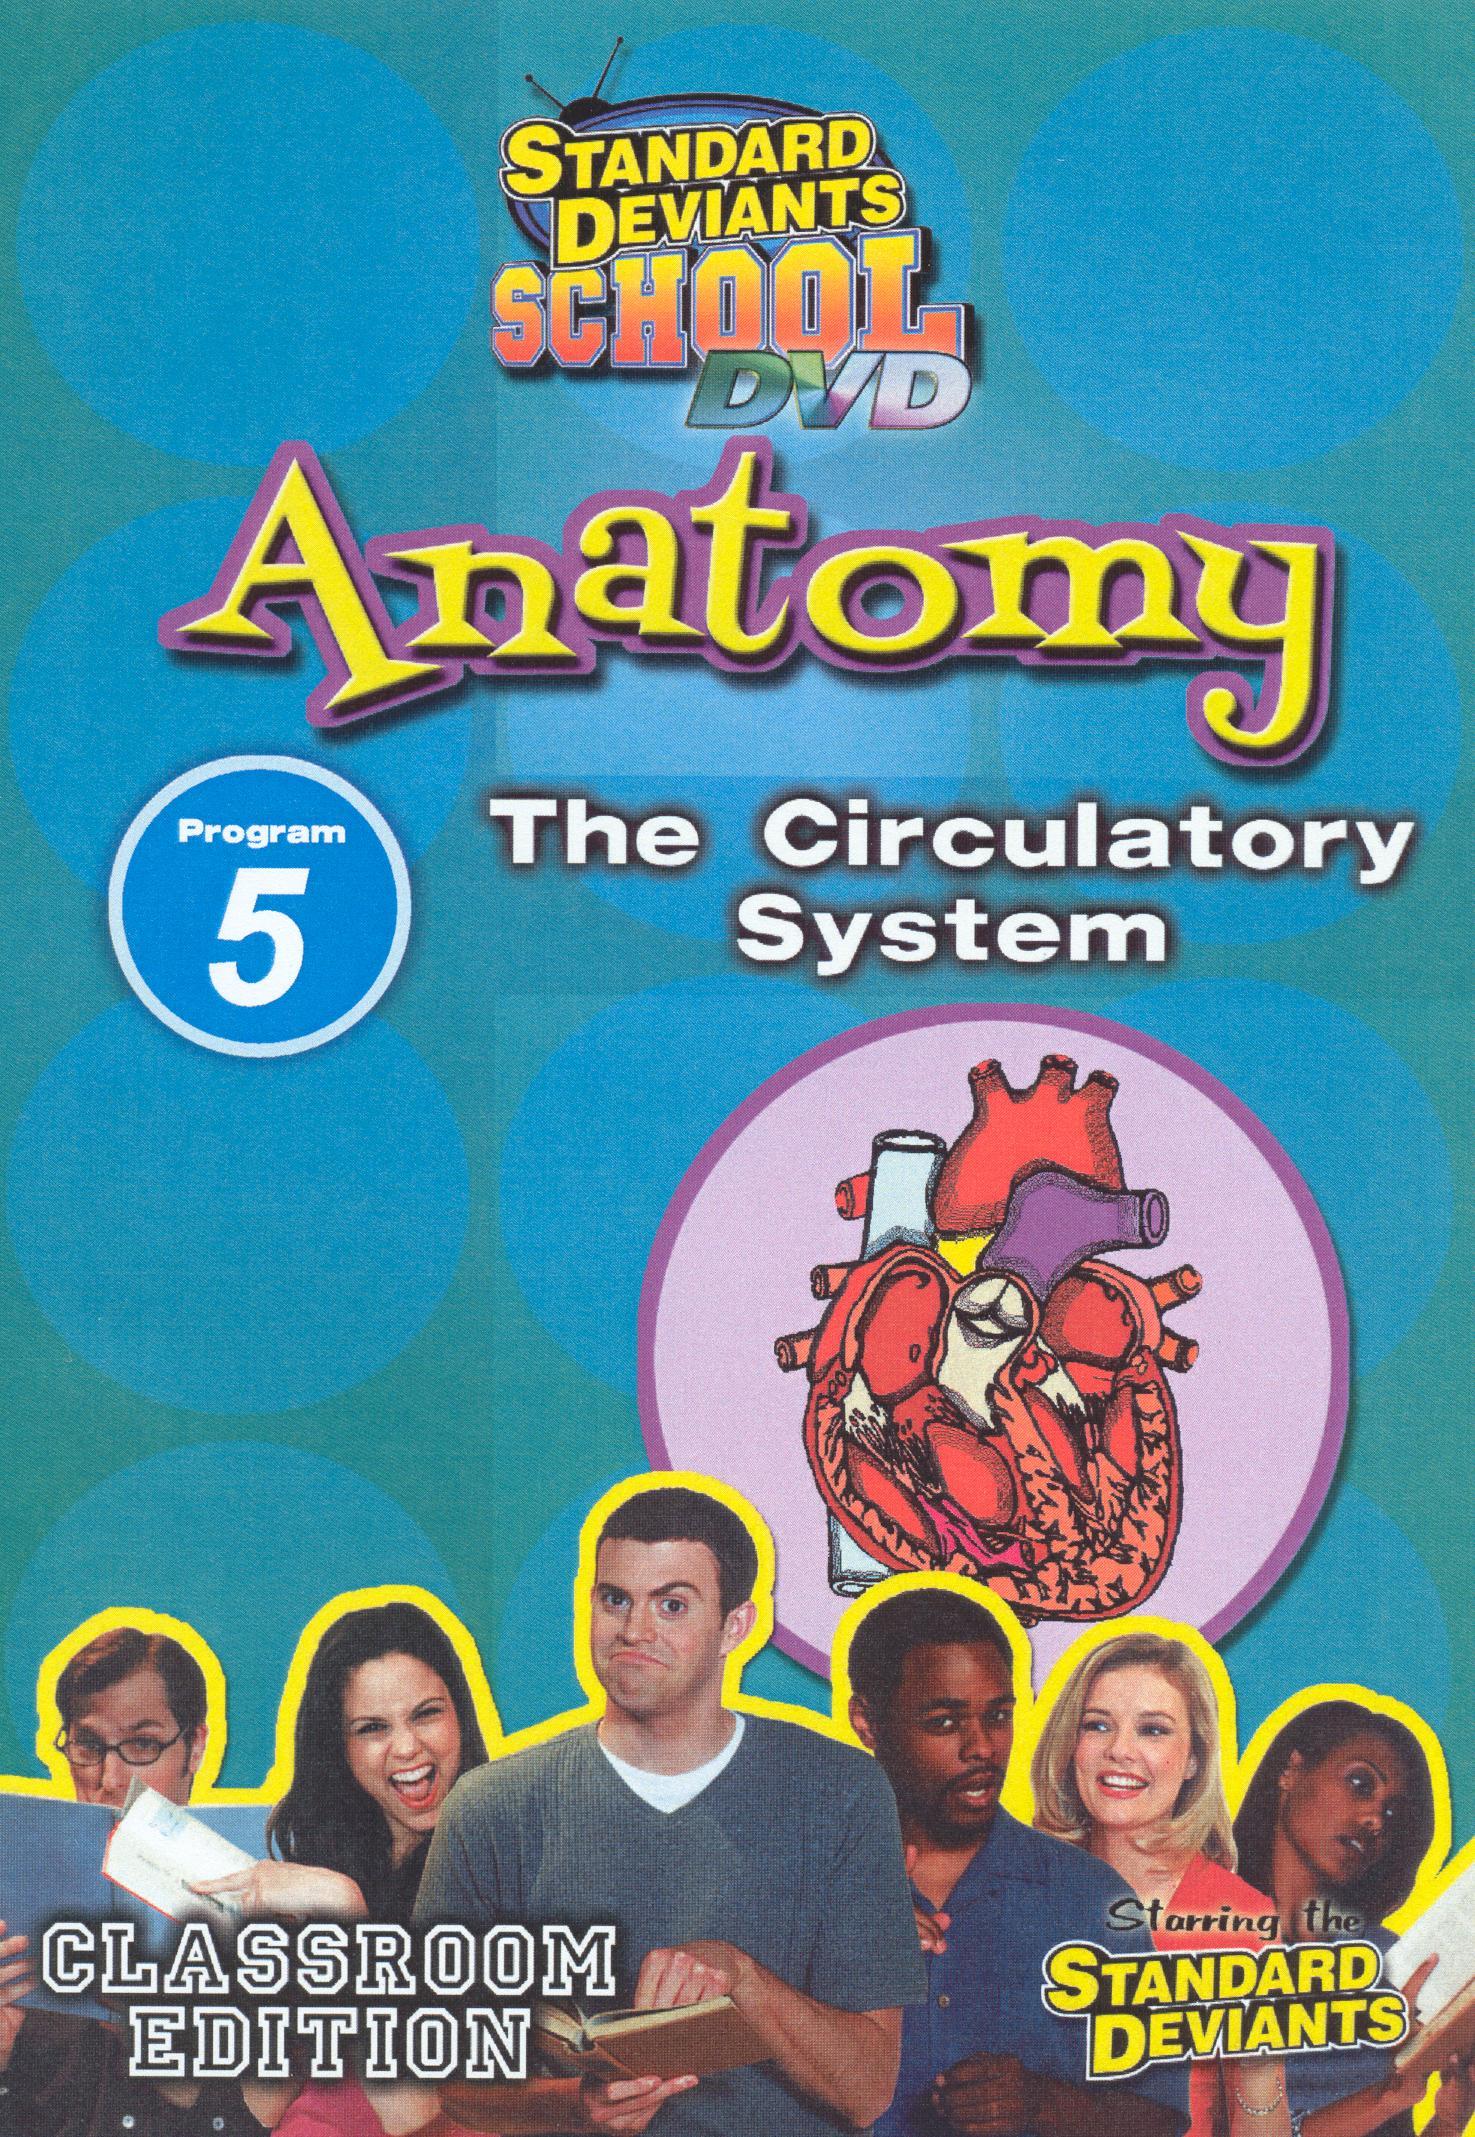 Standard Deviants School: Anatomy, Program 5 - The Circulatory System